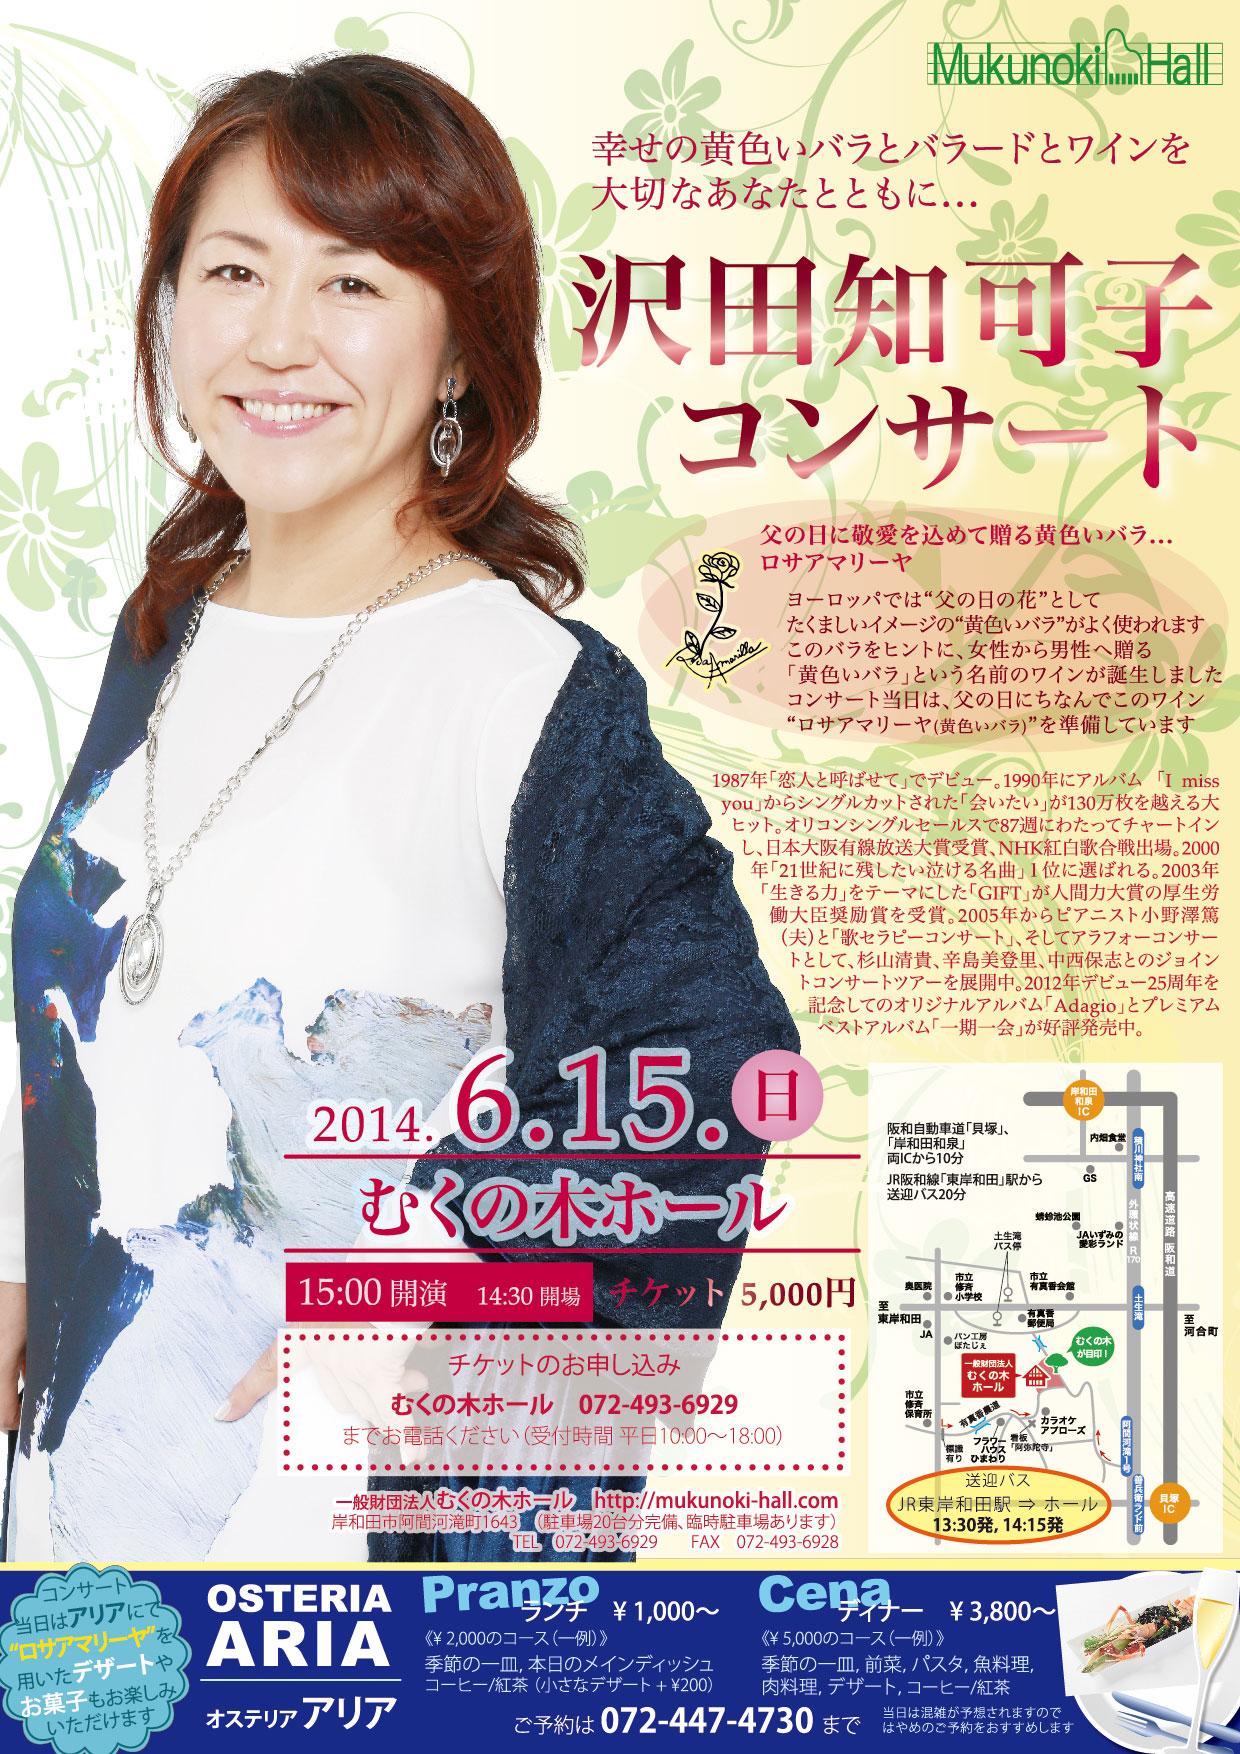 20140615_Mukunoki_Hall